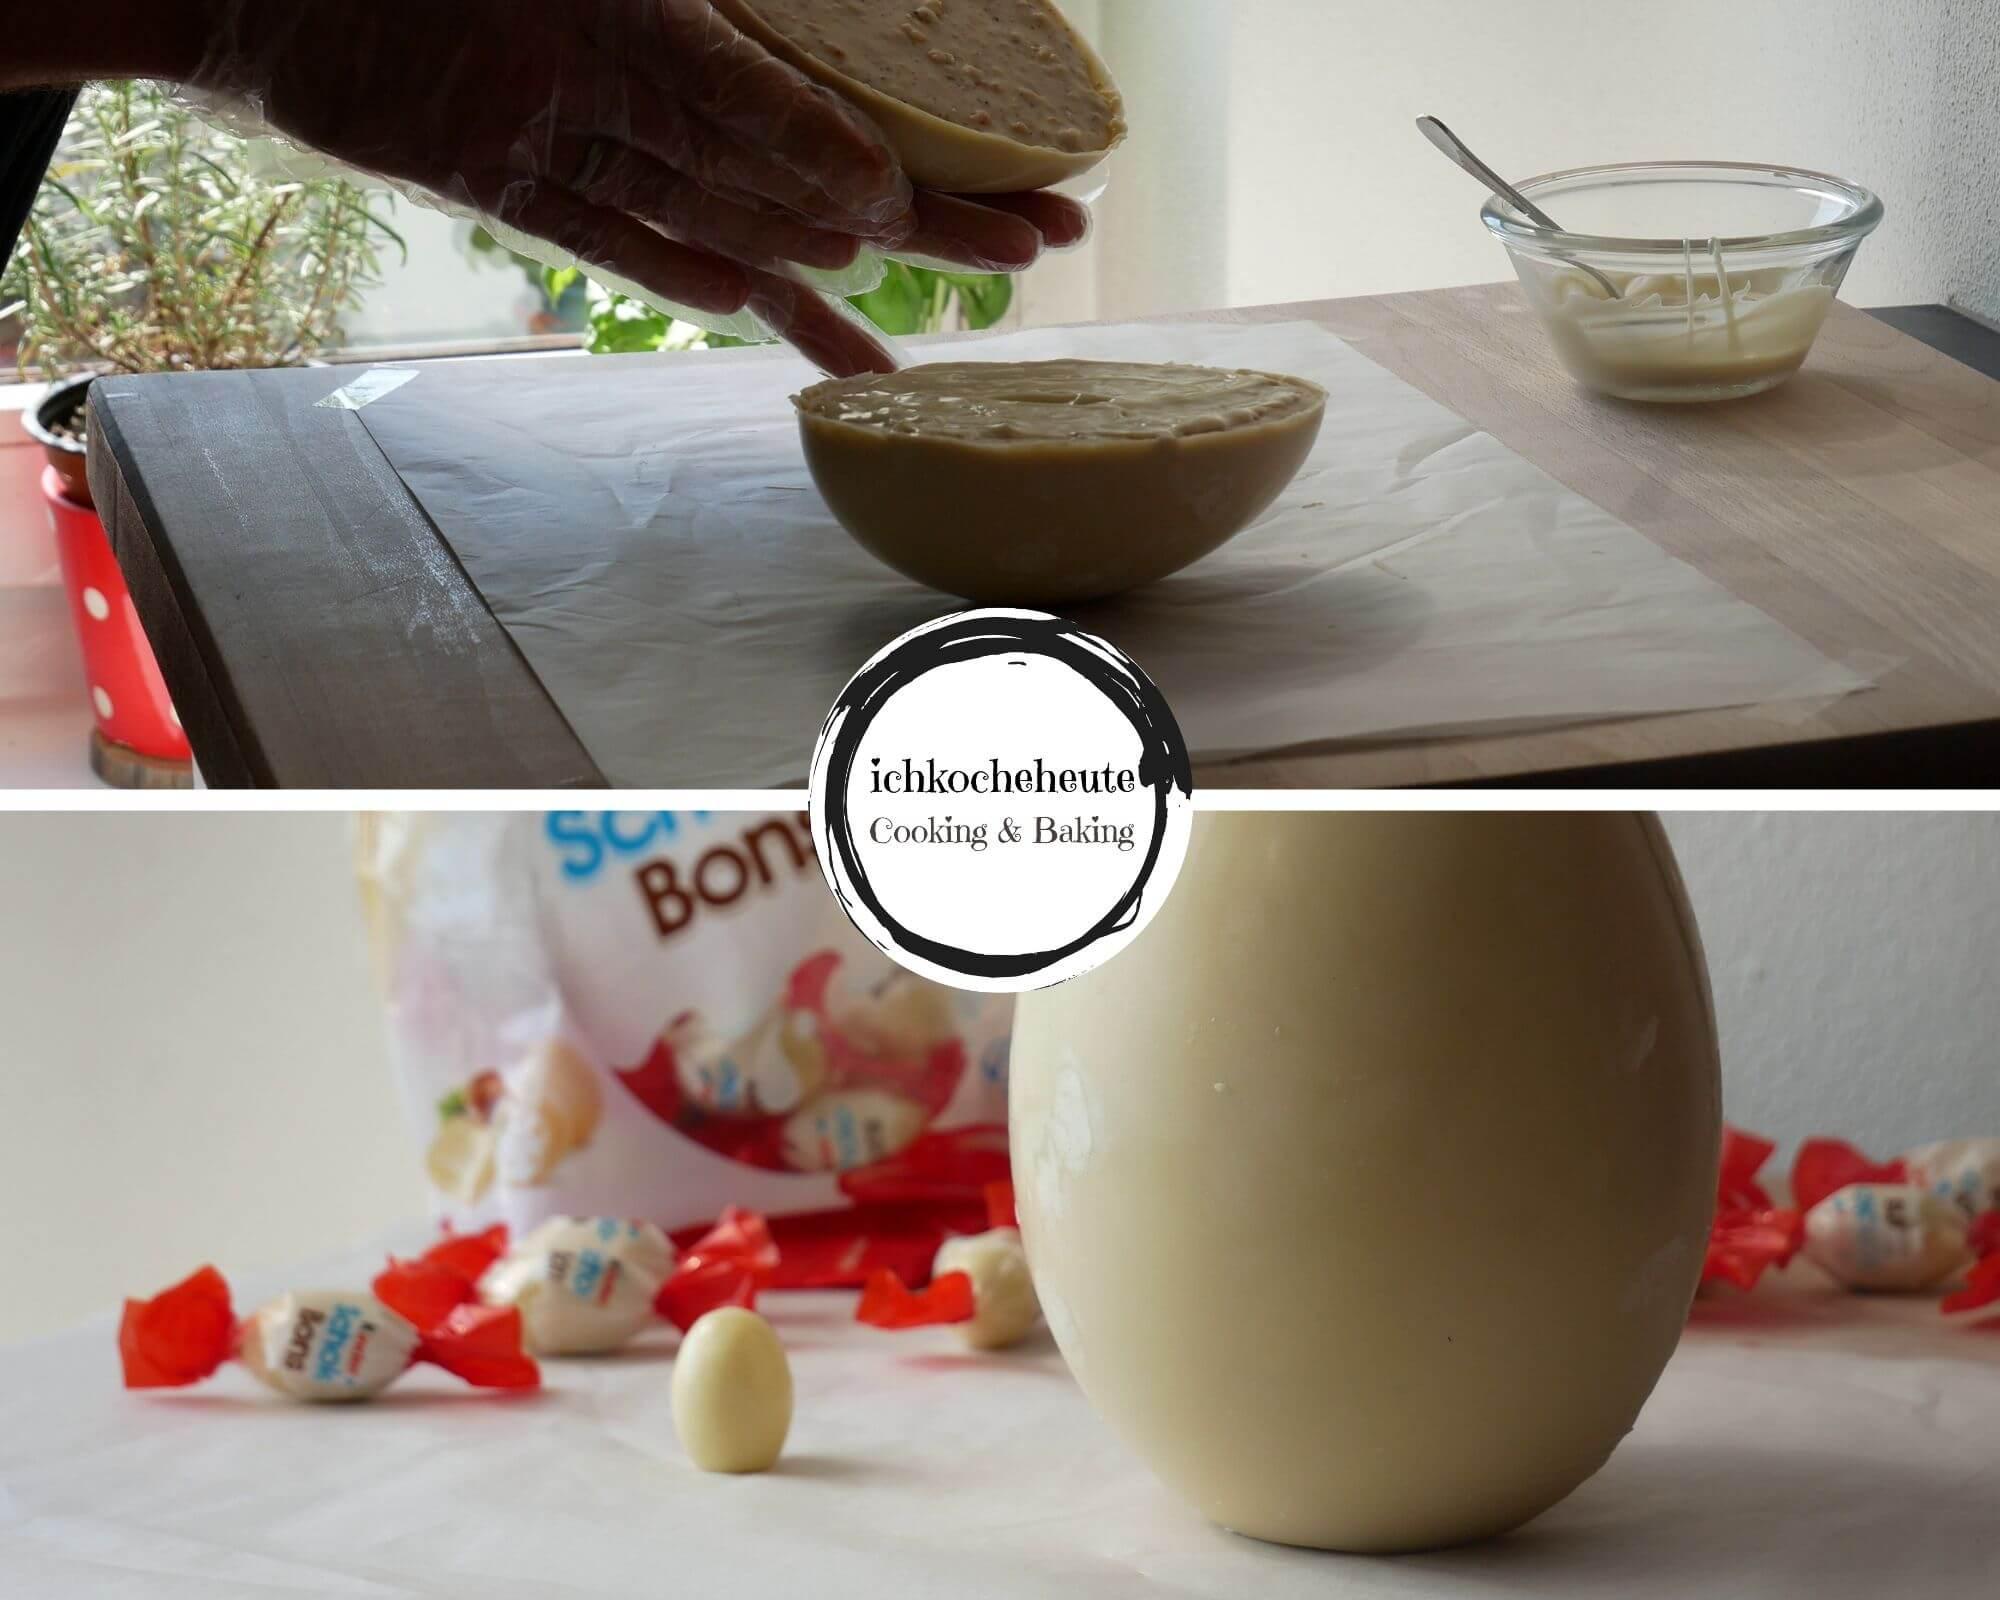 Baking Giant Chocolate Egg